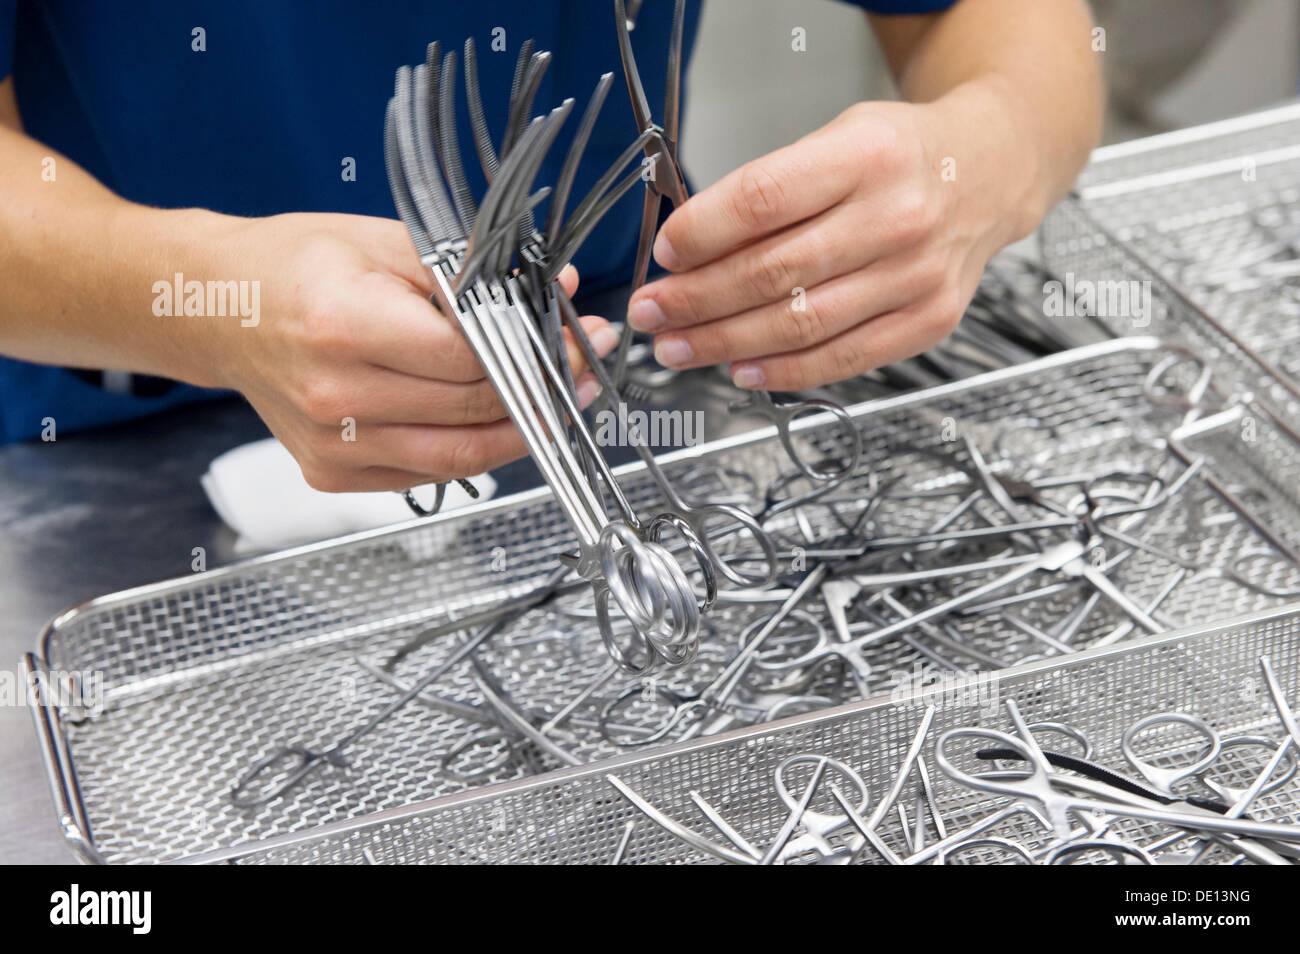 Assembly of instrument sets, Zentrale Sterilgutversorgungsabteilung, Central Sterile Supply Department - Stock Image